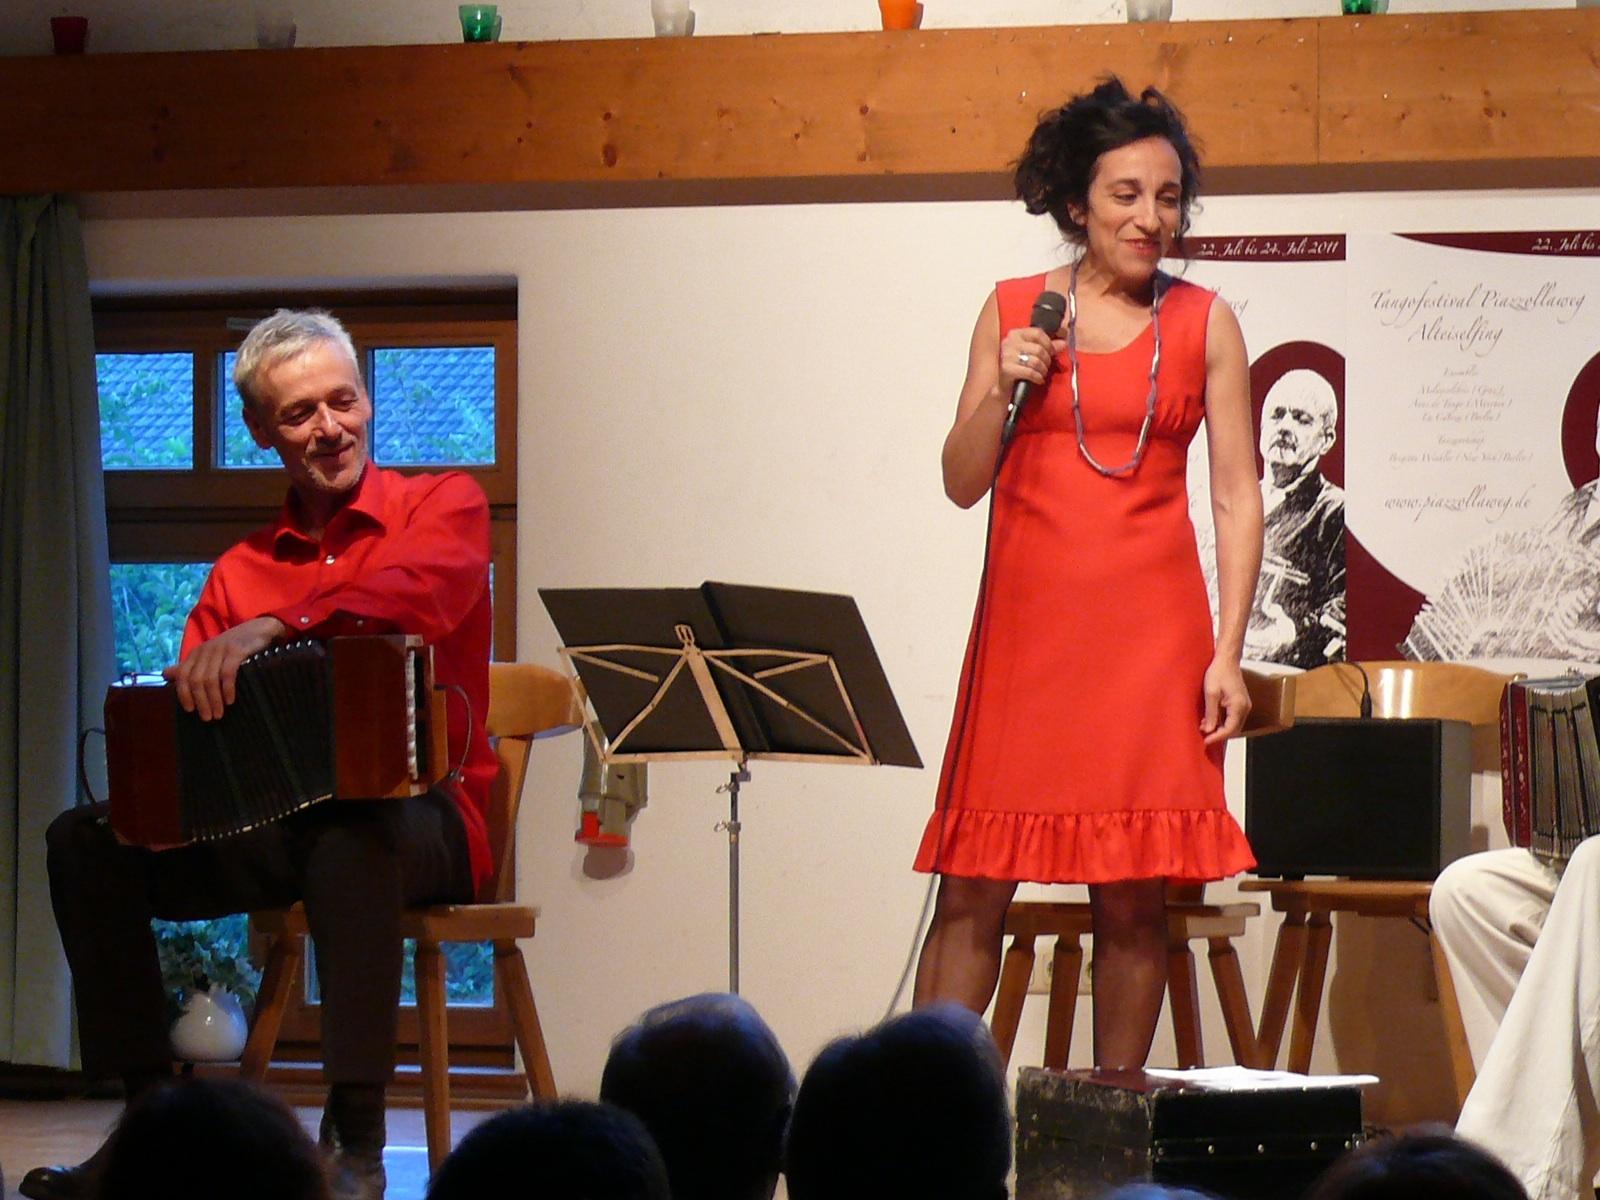 Sandra Nahabian Festivalband3